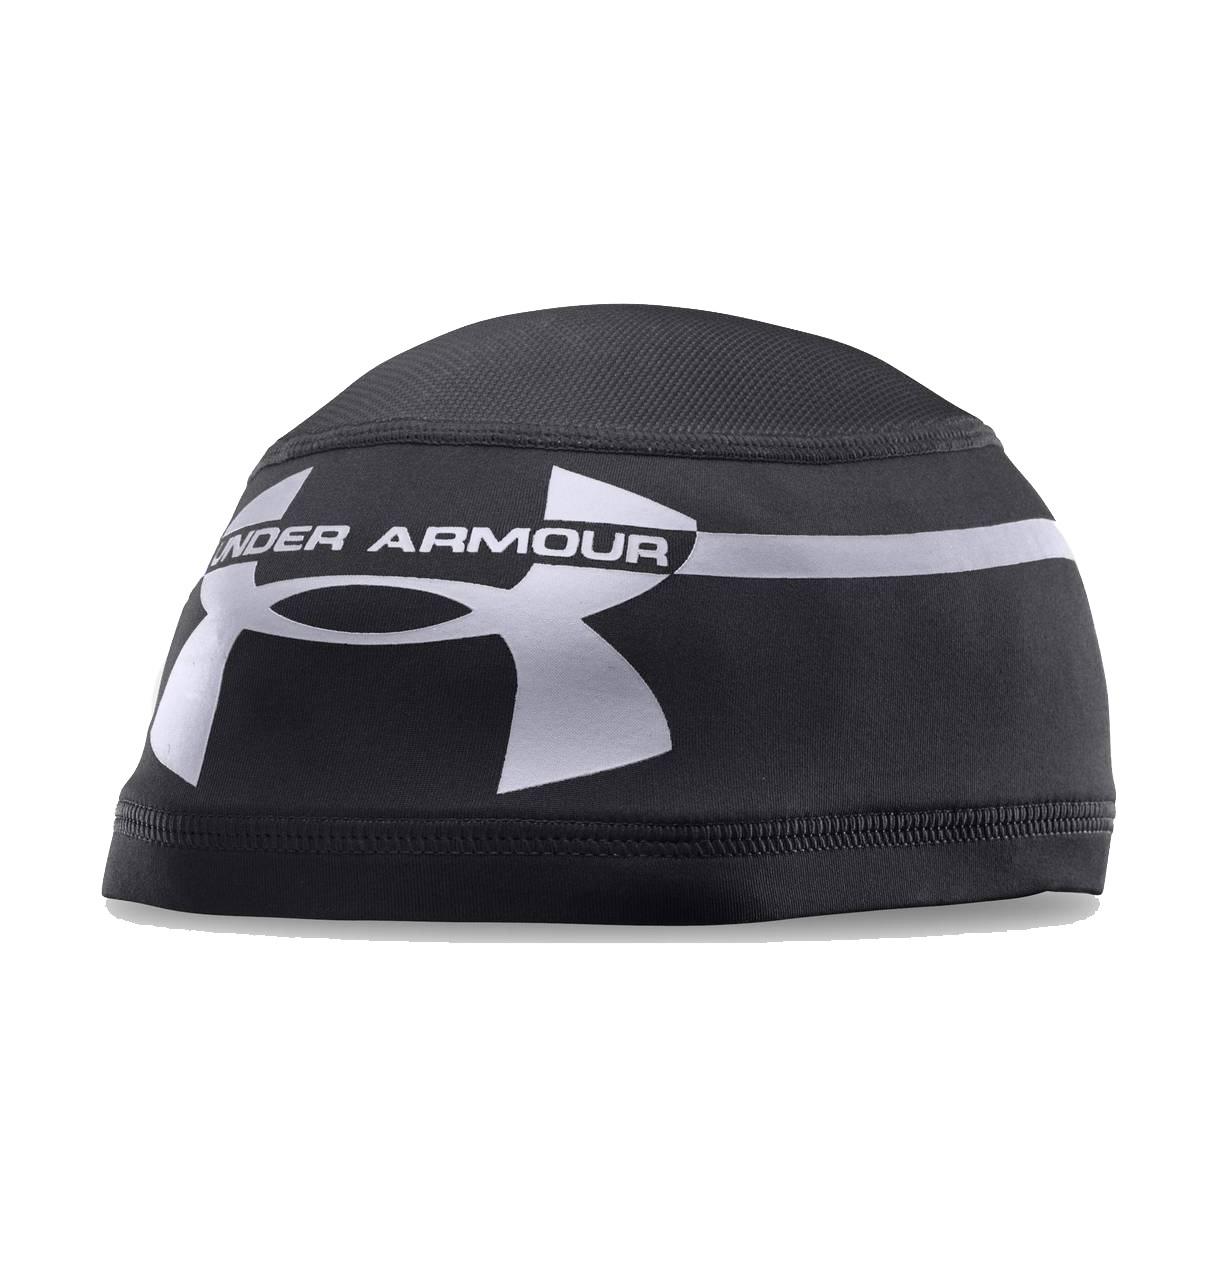 Under Armour Mesh Skullcap 2.0